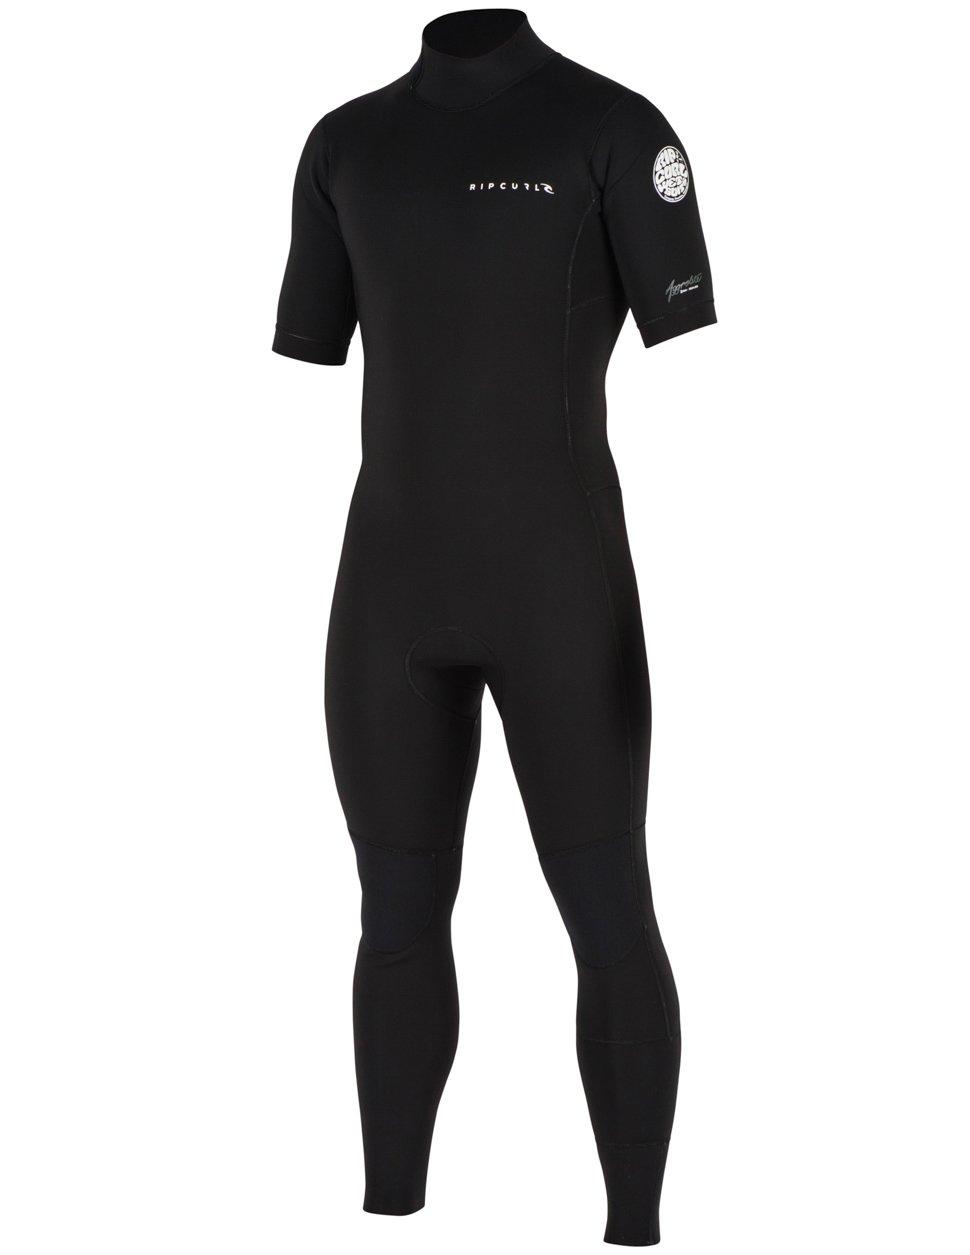 Rip Curl Mens Aggrolite S/S Full Back Zip Wetsuit Black S'19